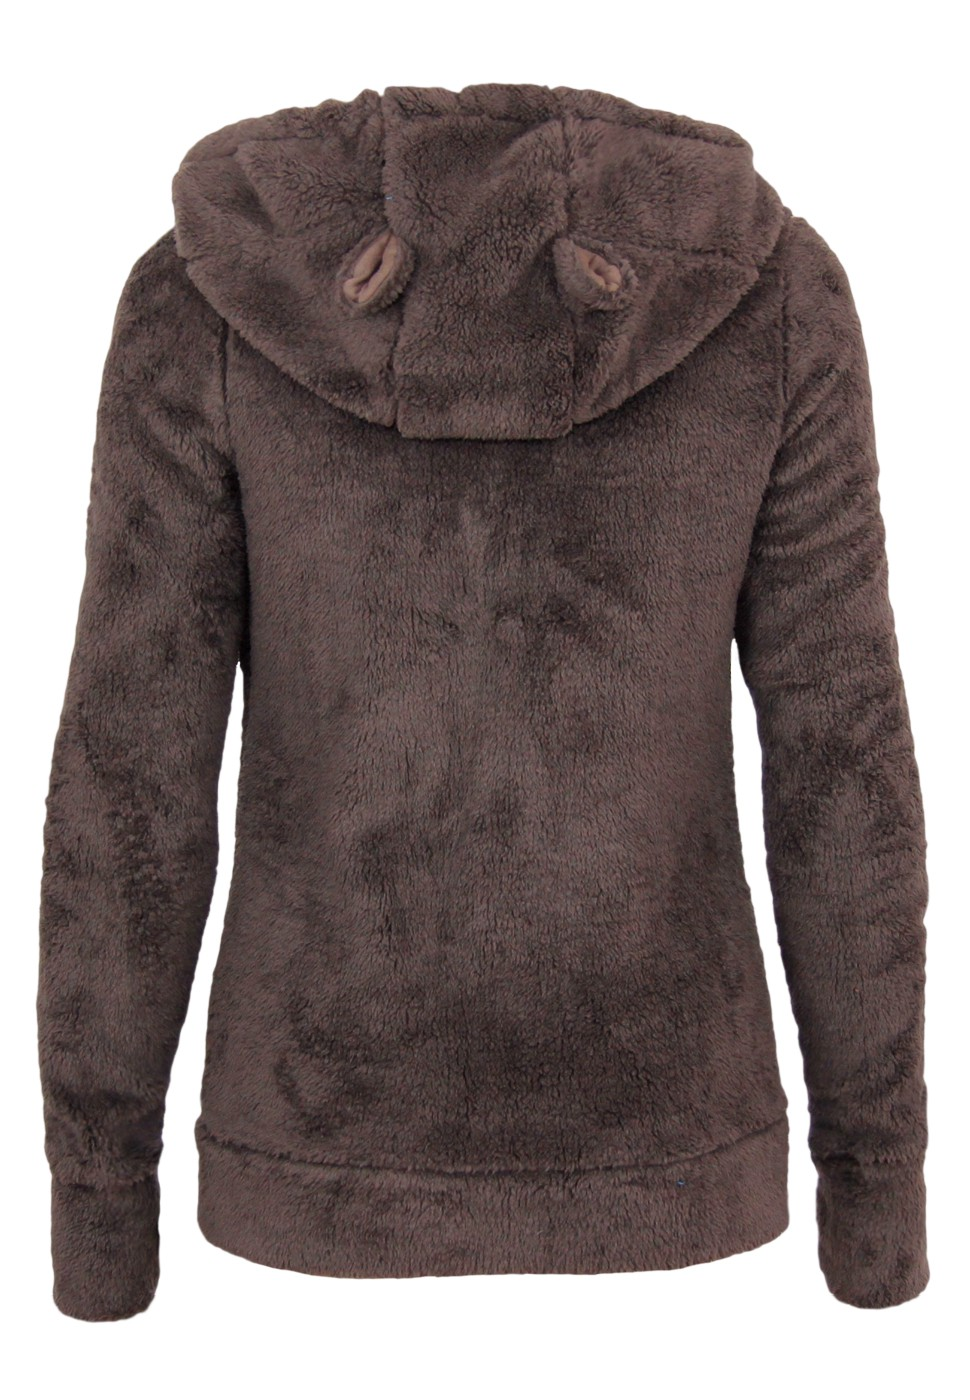 stitch soul teddy fleece jacke mit hrchen damen sweatshirts. Black Bedroom Furniture Sets. Home Design Ideas